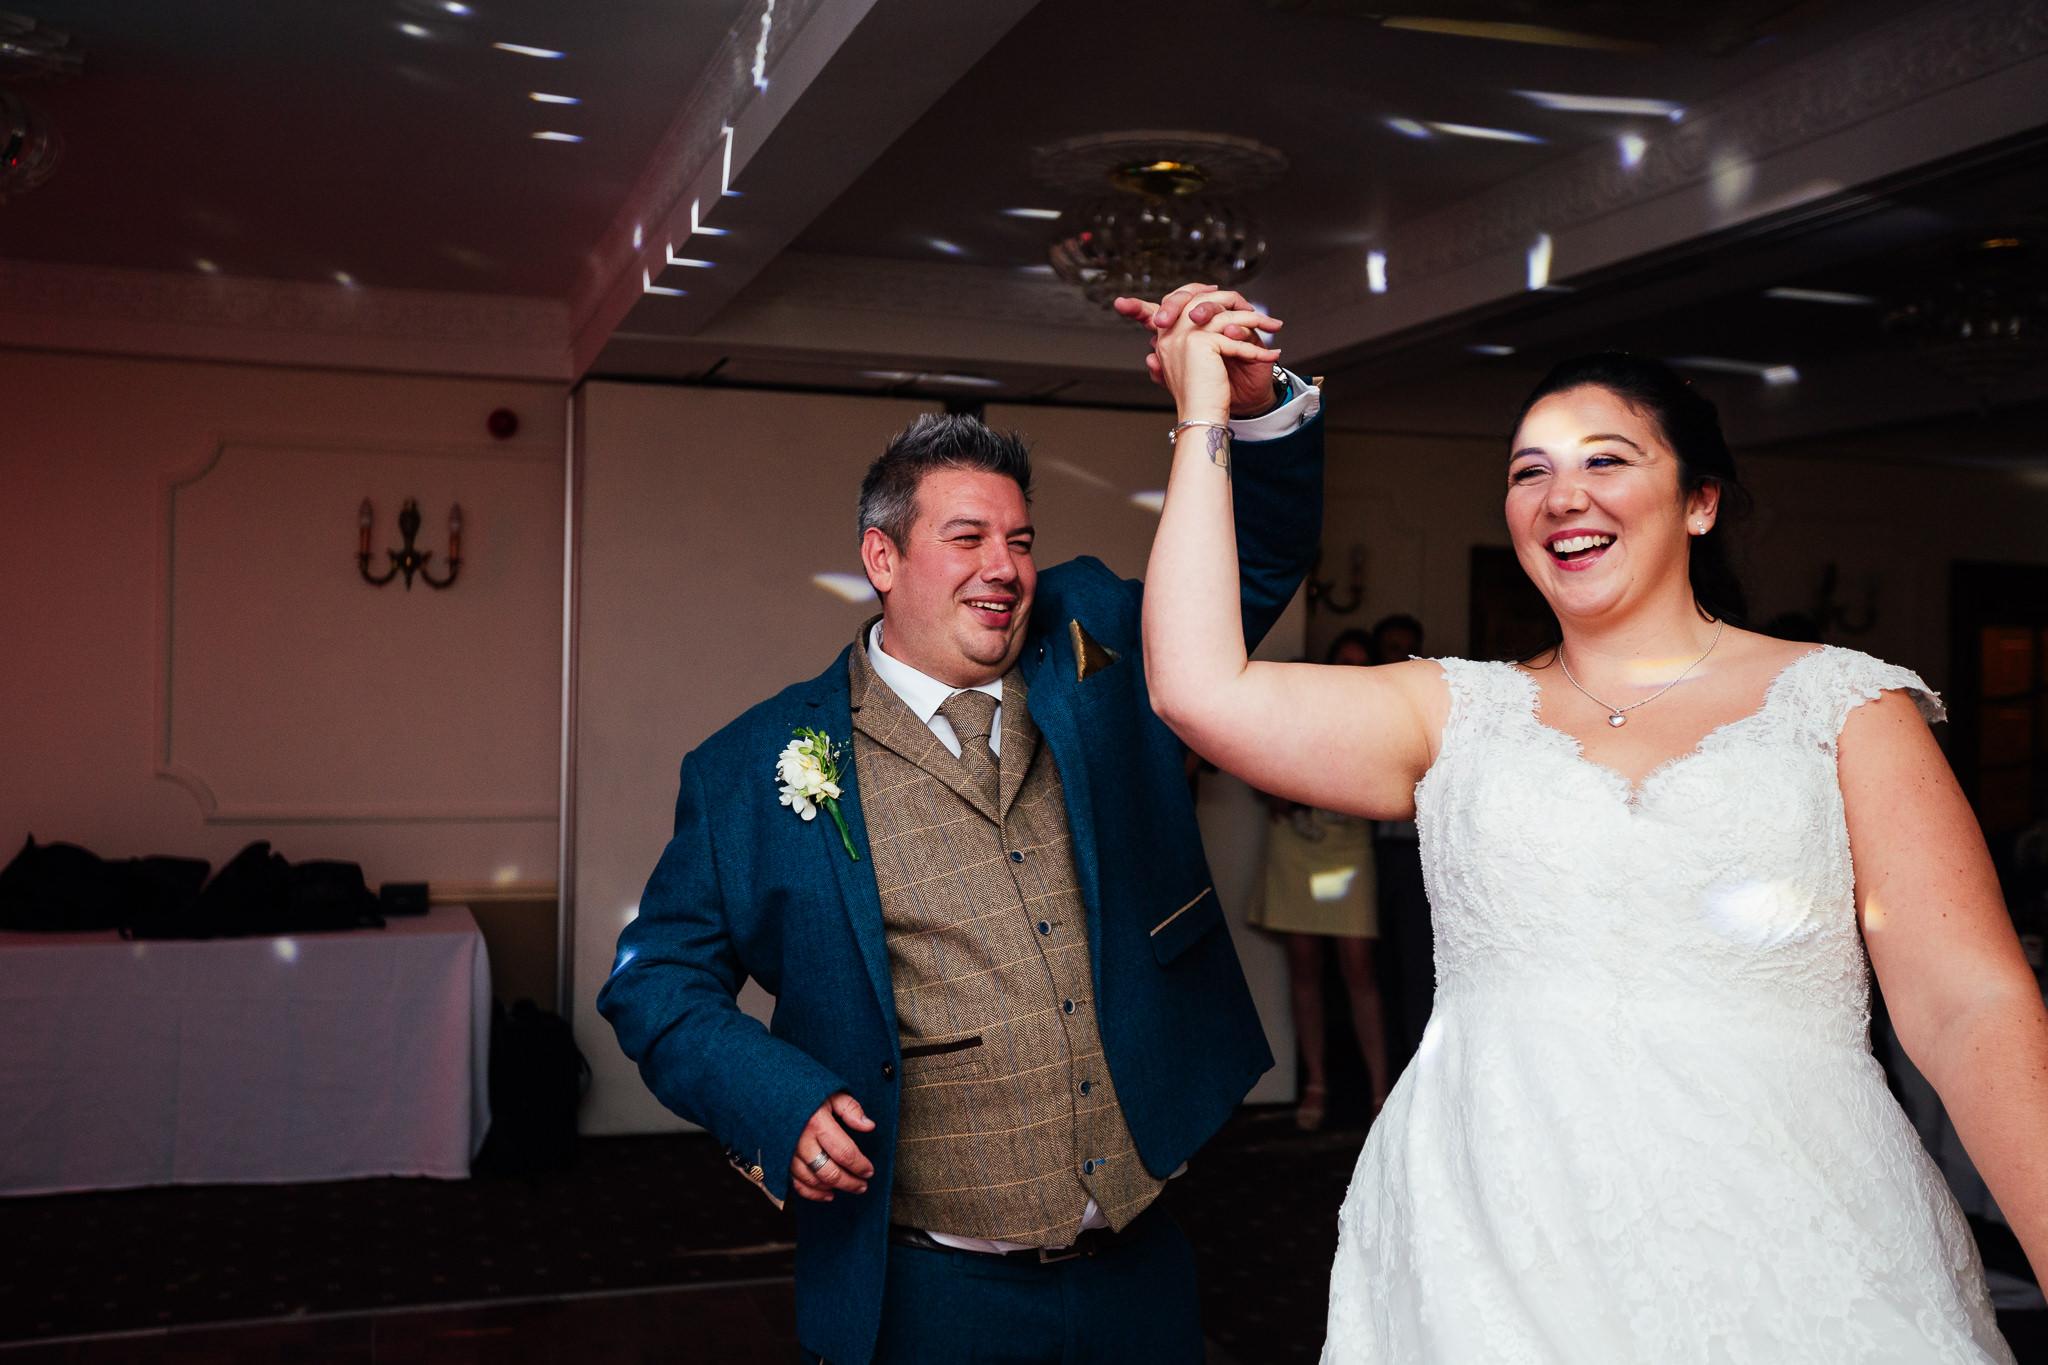 Willington-Hall-Cheshire-Wedding-45.jpg